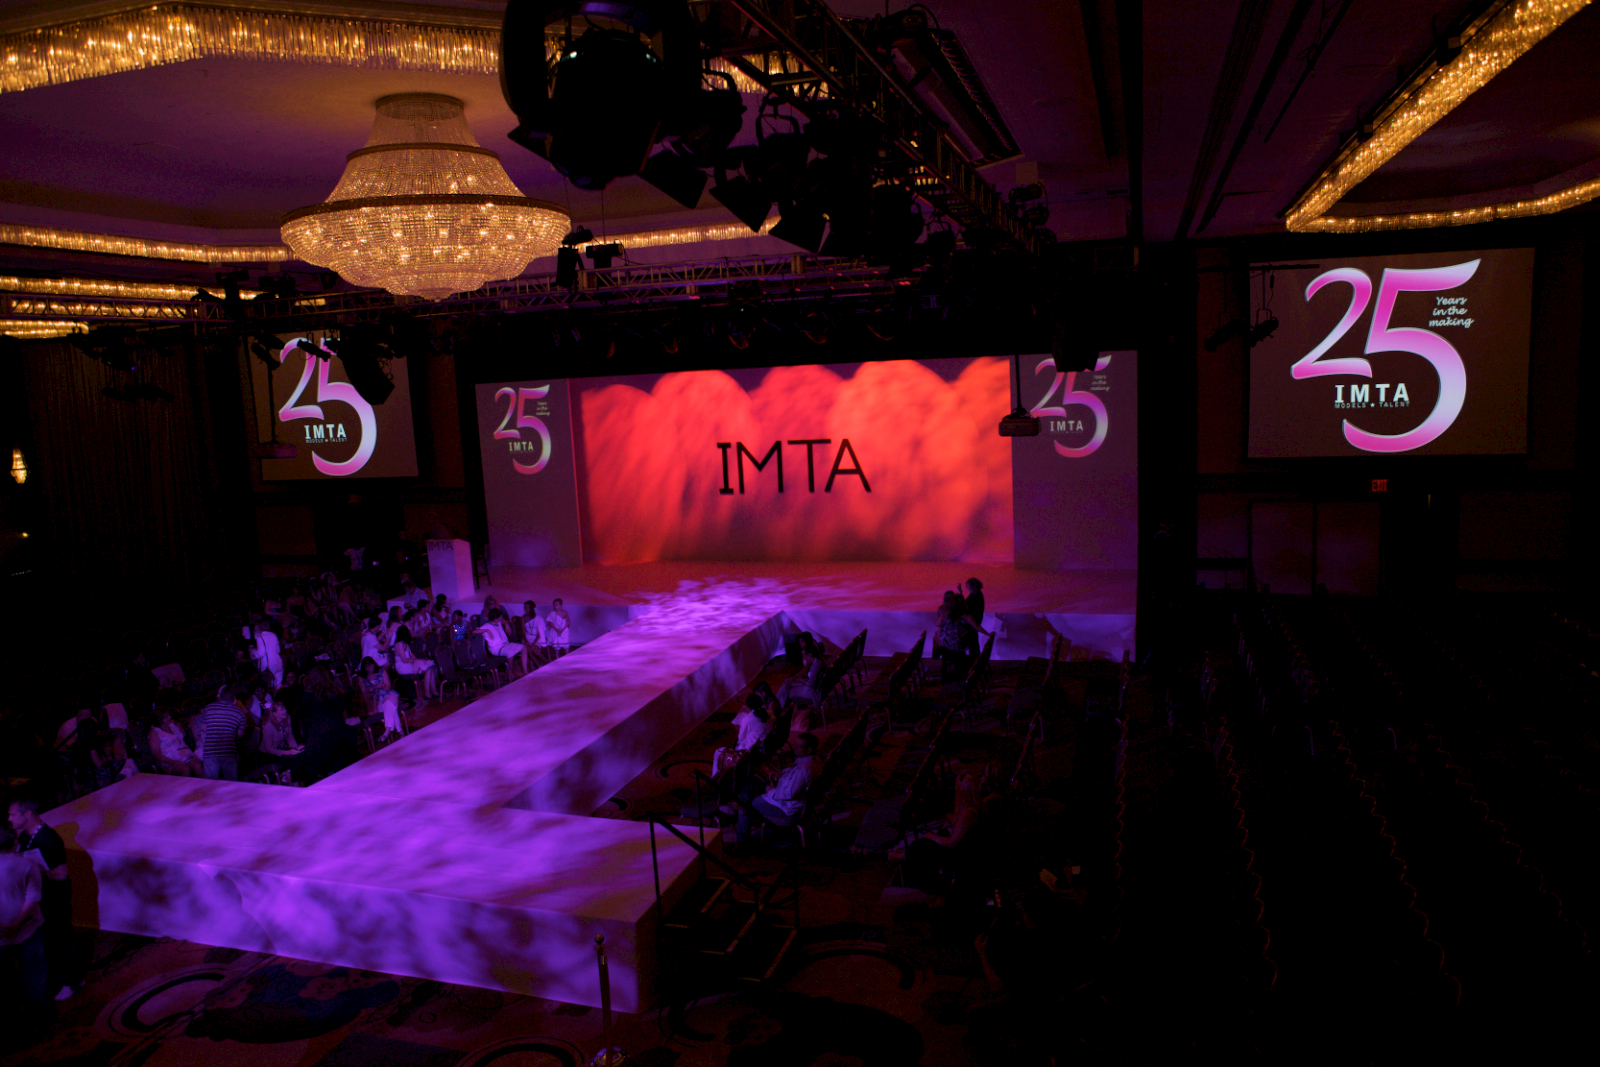 IMTA 2011  1.jpg